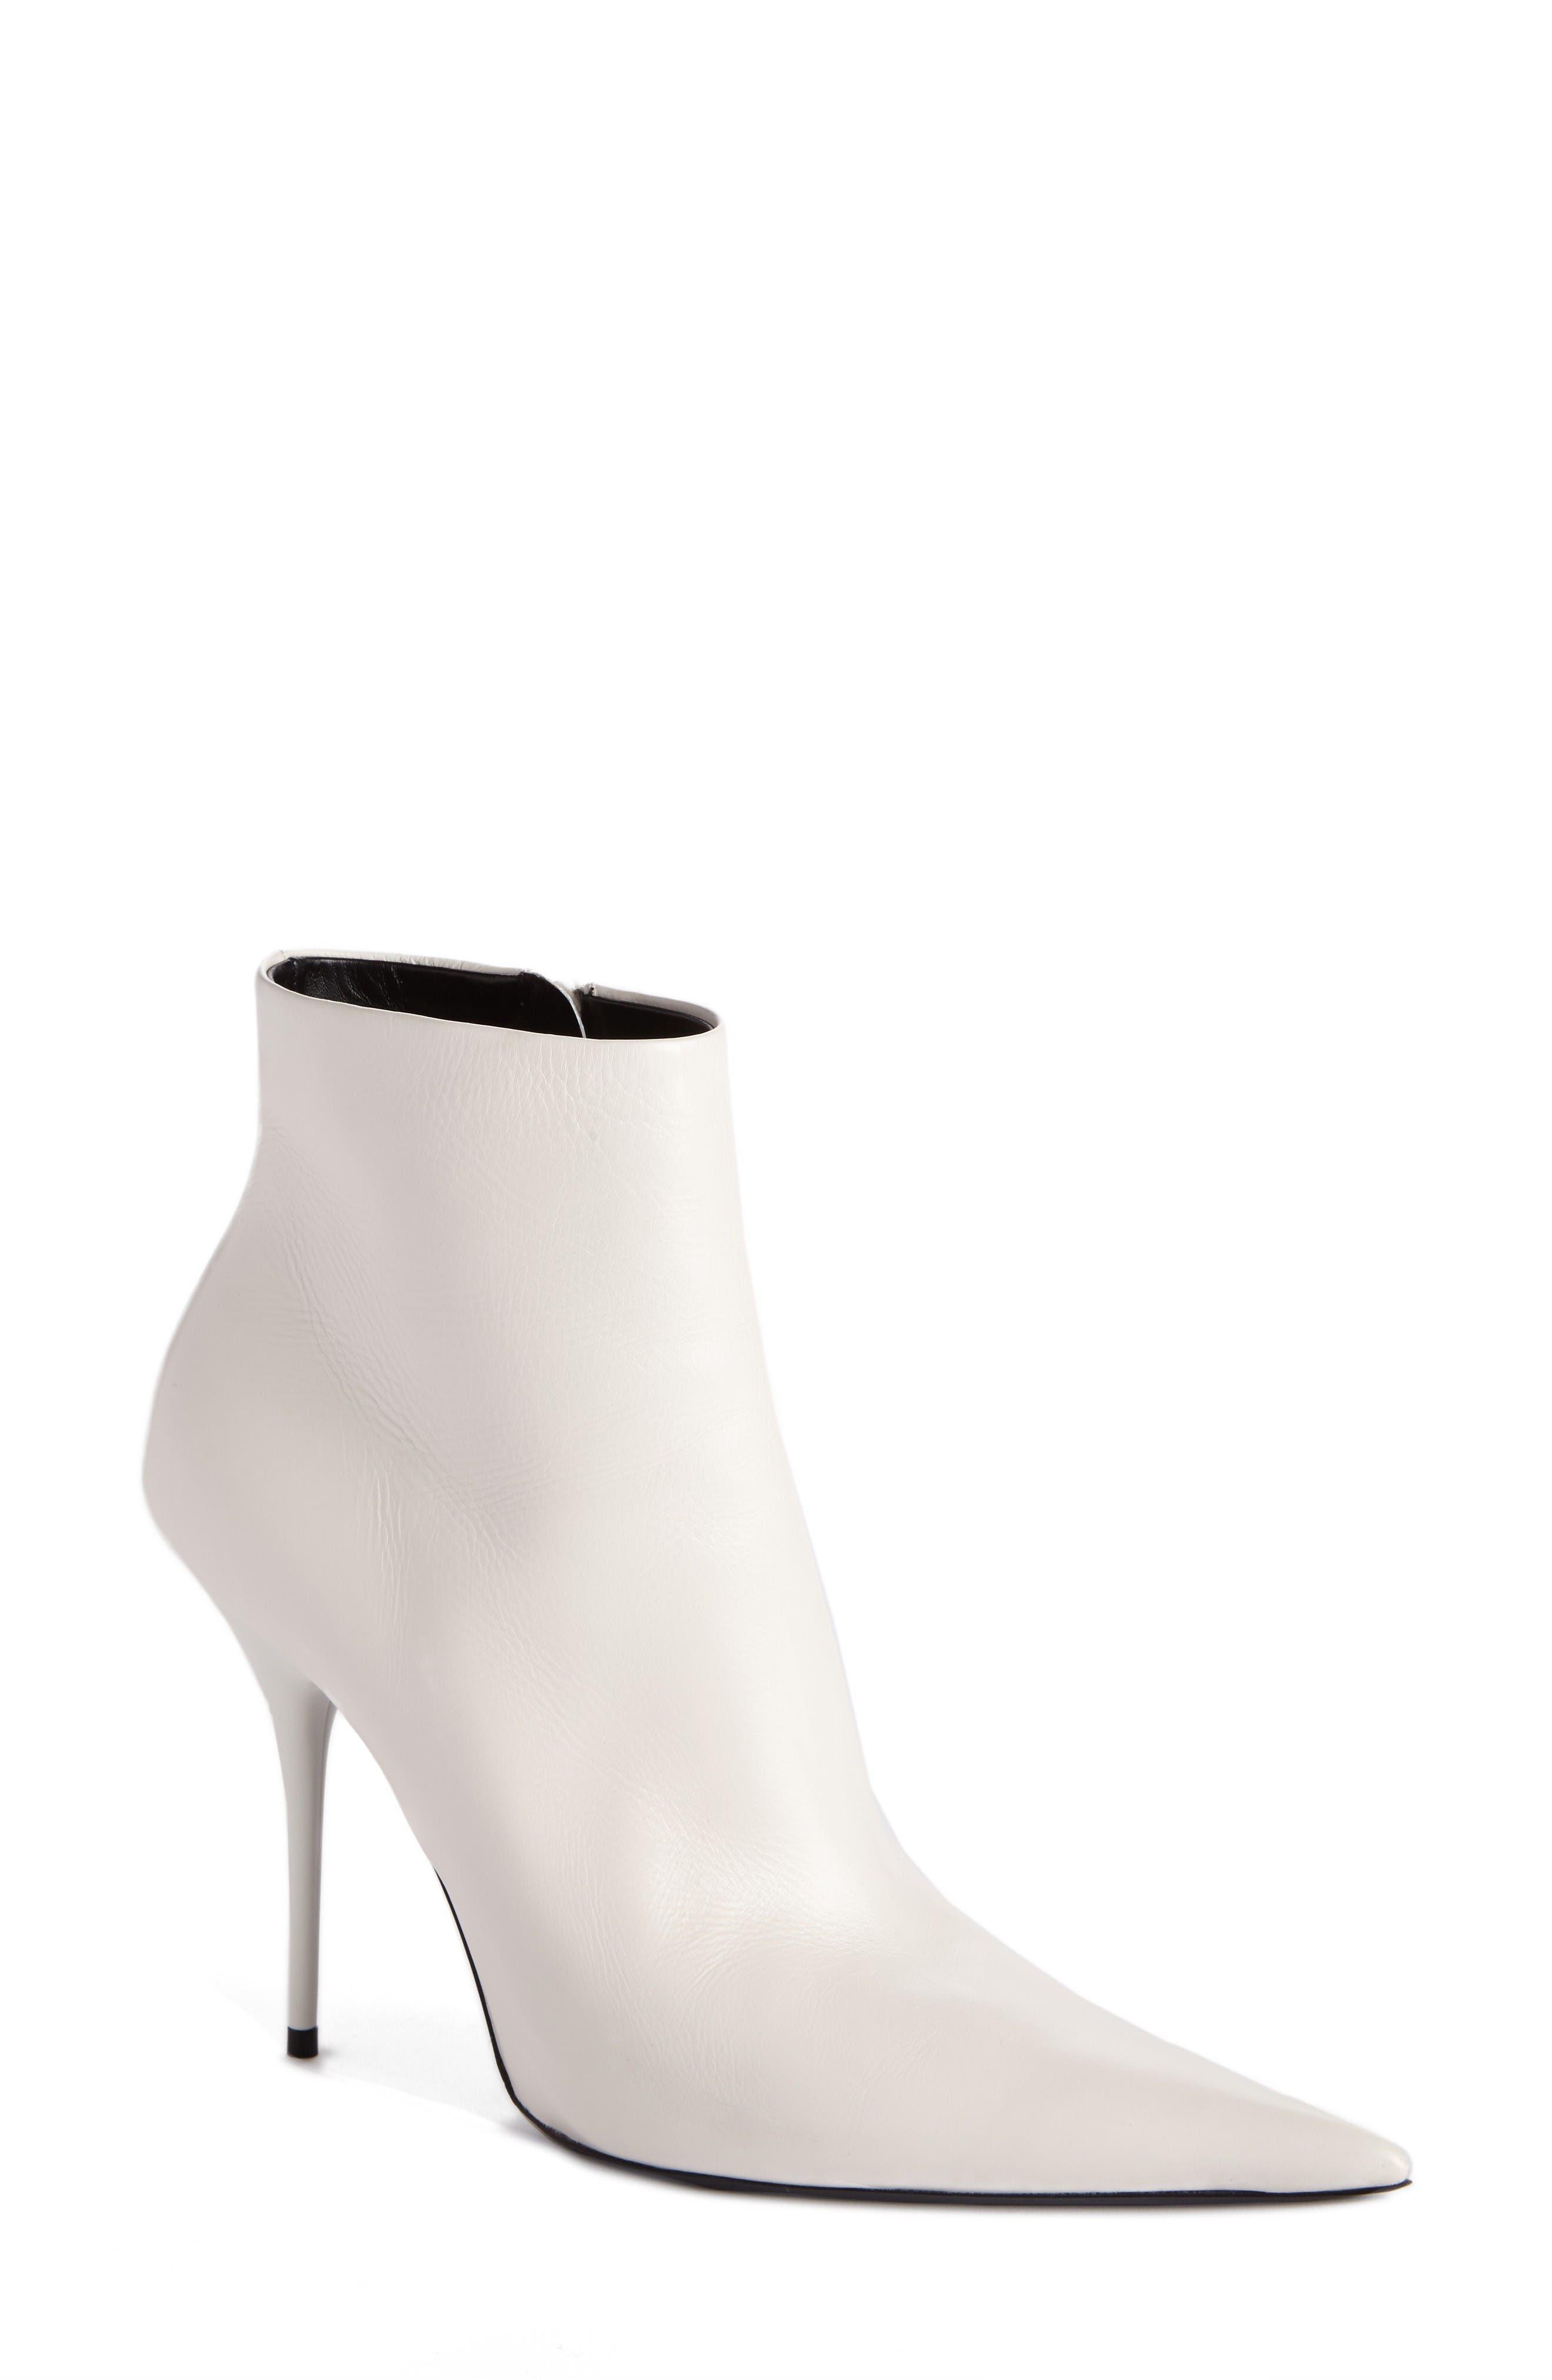 Alternate Image 1 Selected - Balenciaga Pointy Toe Bootie (Women)